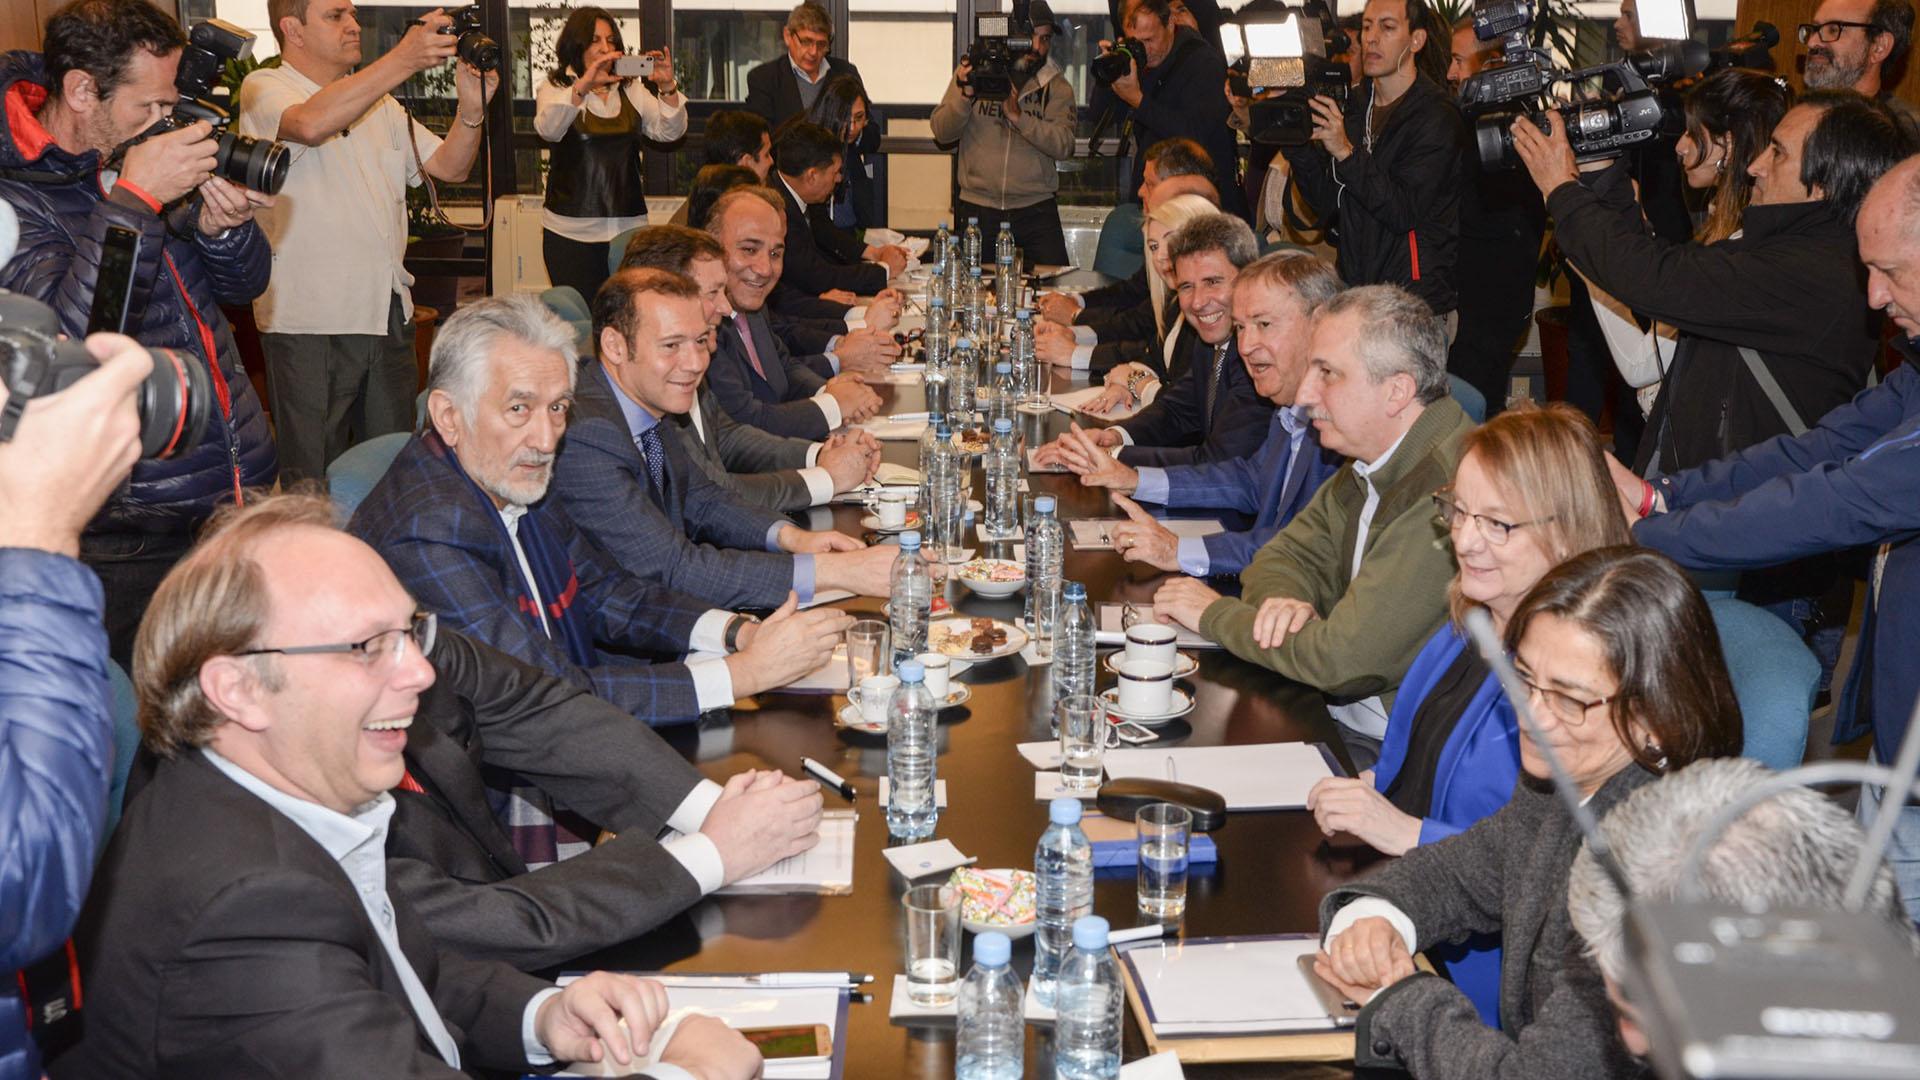 Loa gobernadores estuvieron reunidos en el CFI